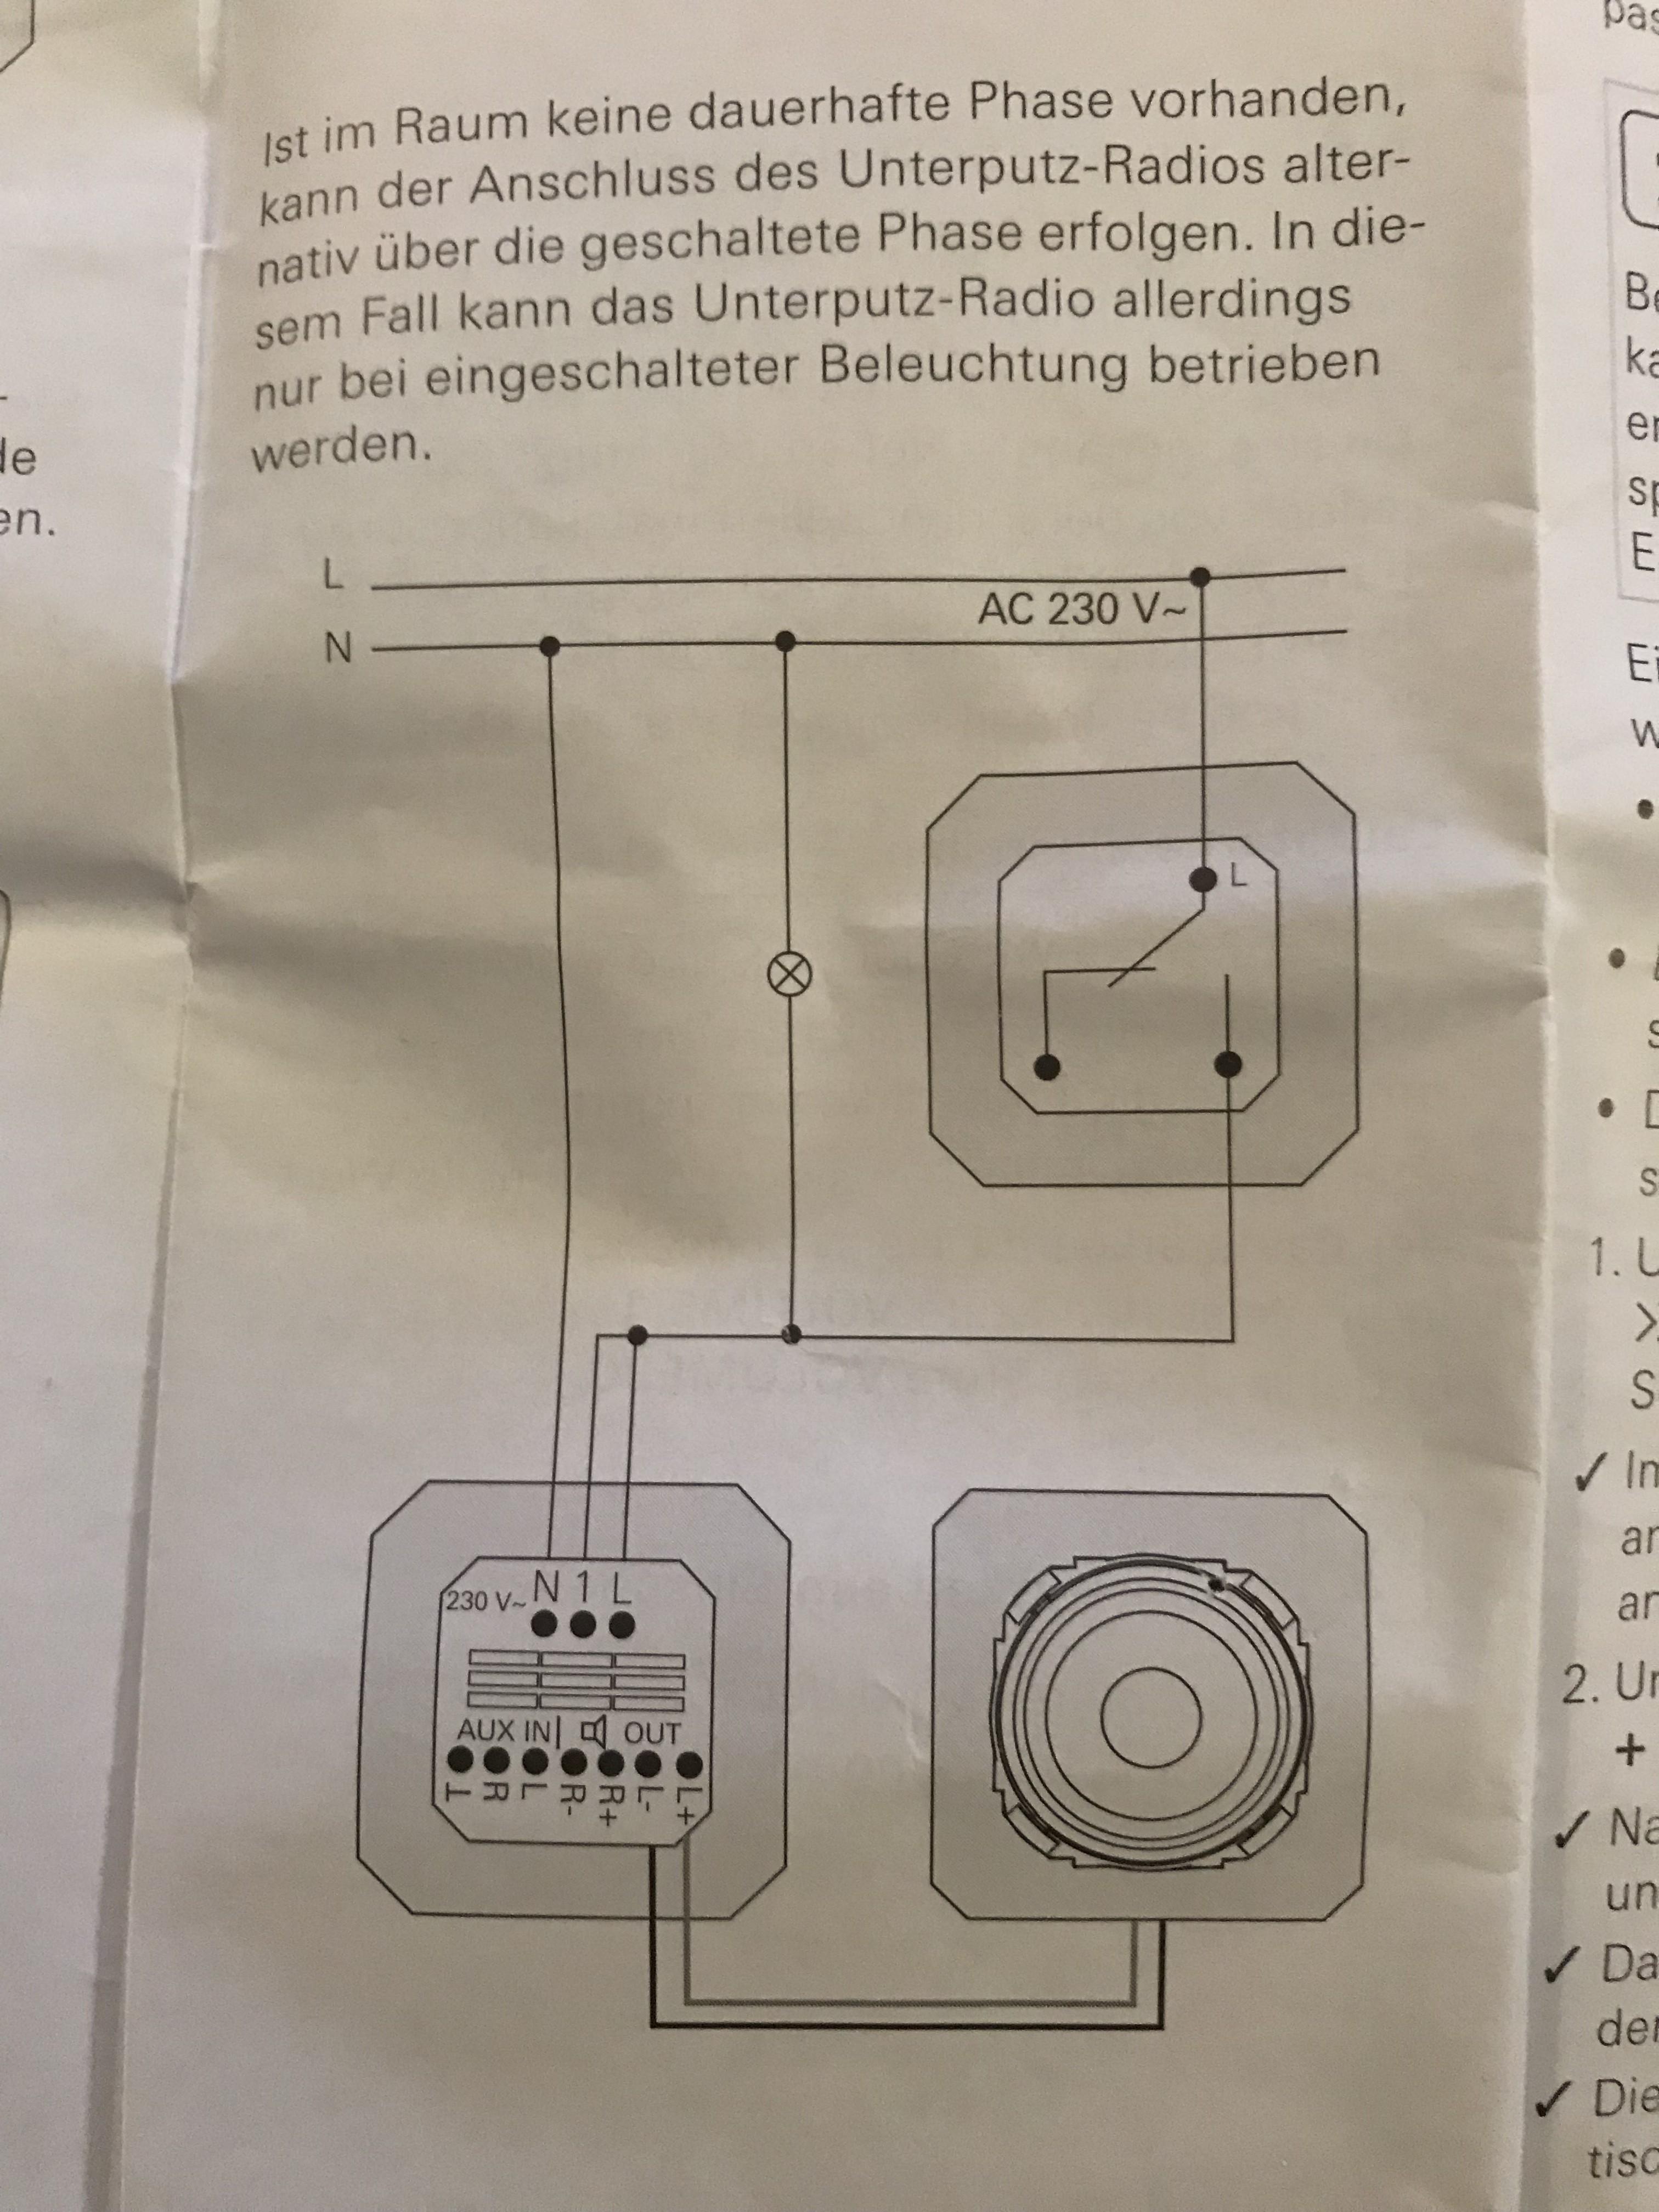 Charmant Kann Verdrahtung Beleuchten Fotos - Elektrische Schaltplan ...